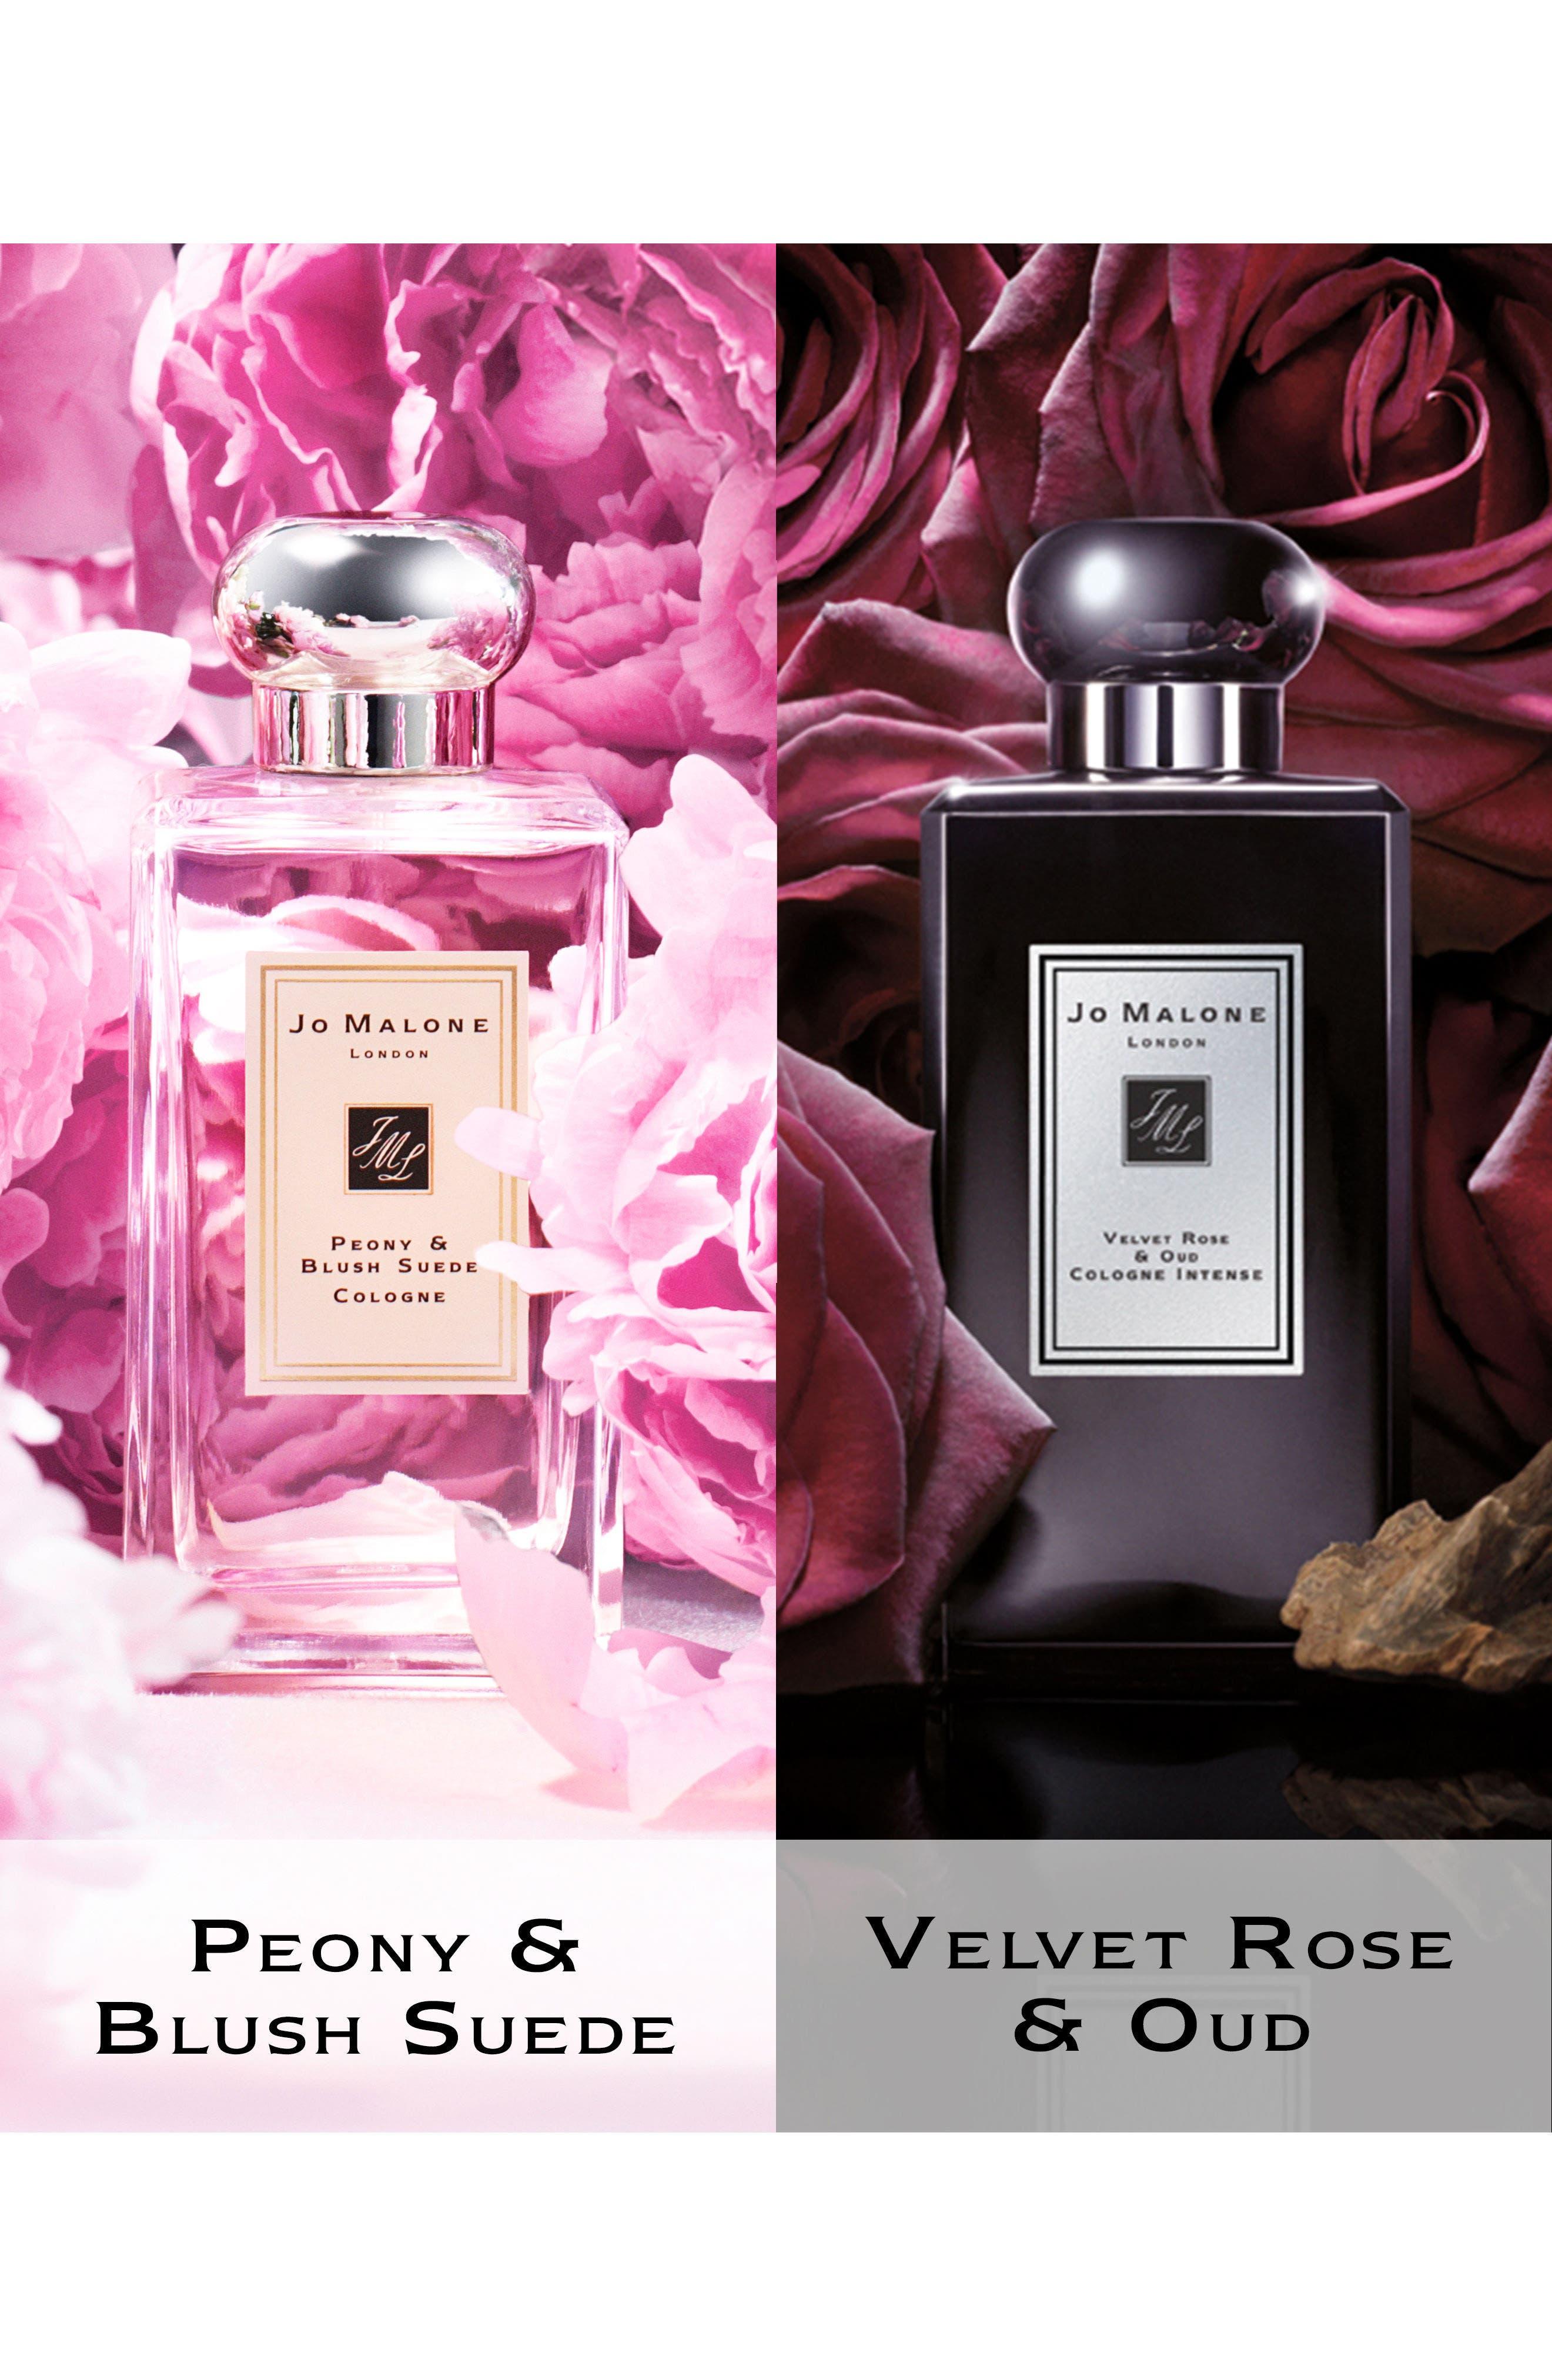 Jo Malone London™ Peony & Blush Suede & Velvet Rose & Oud